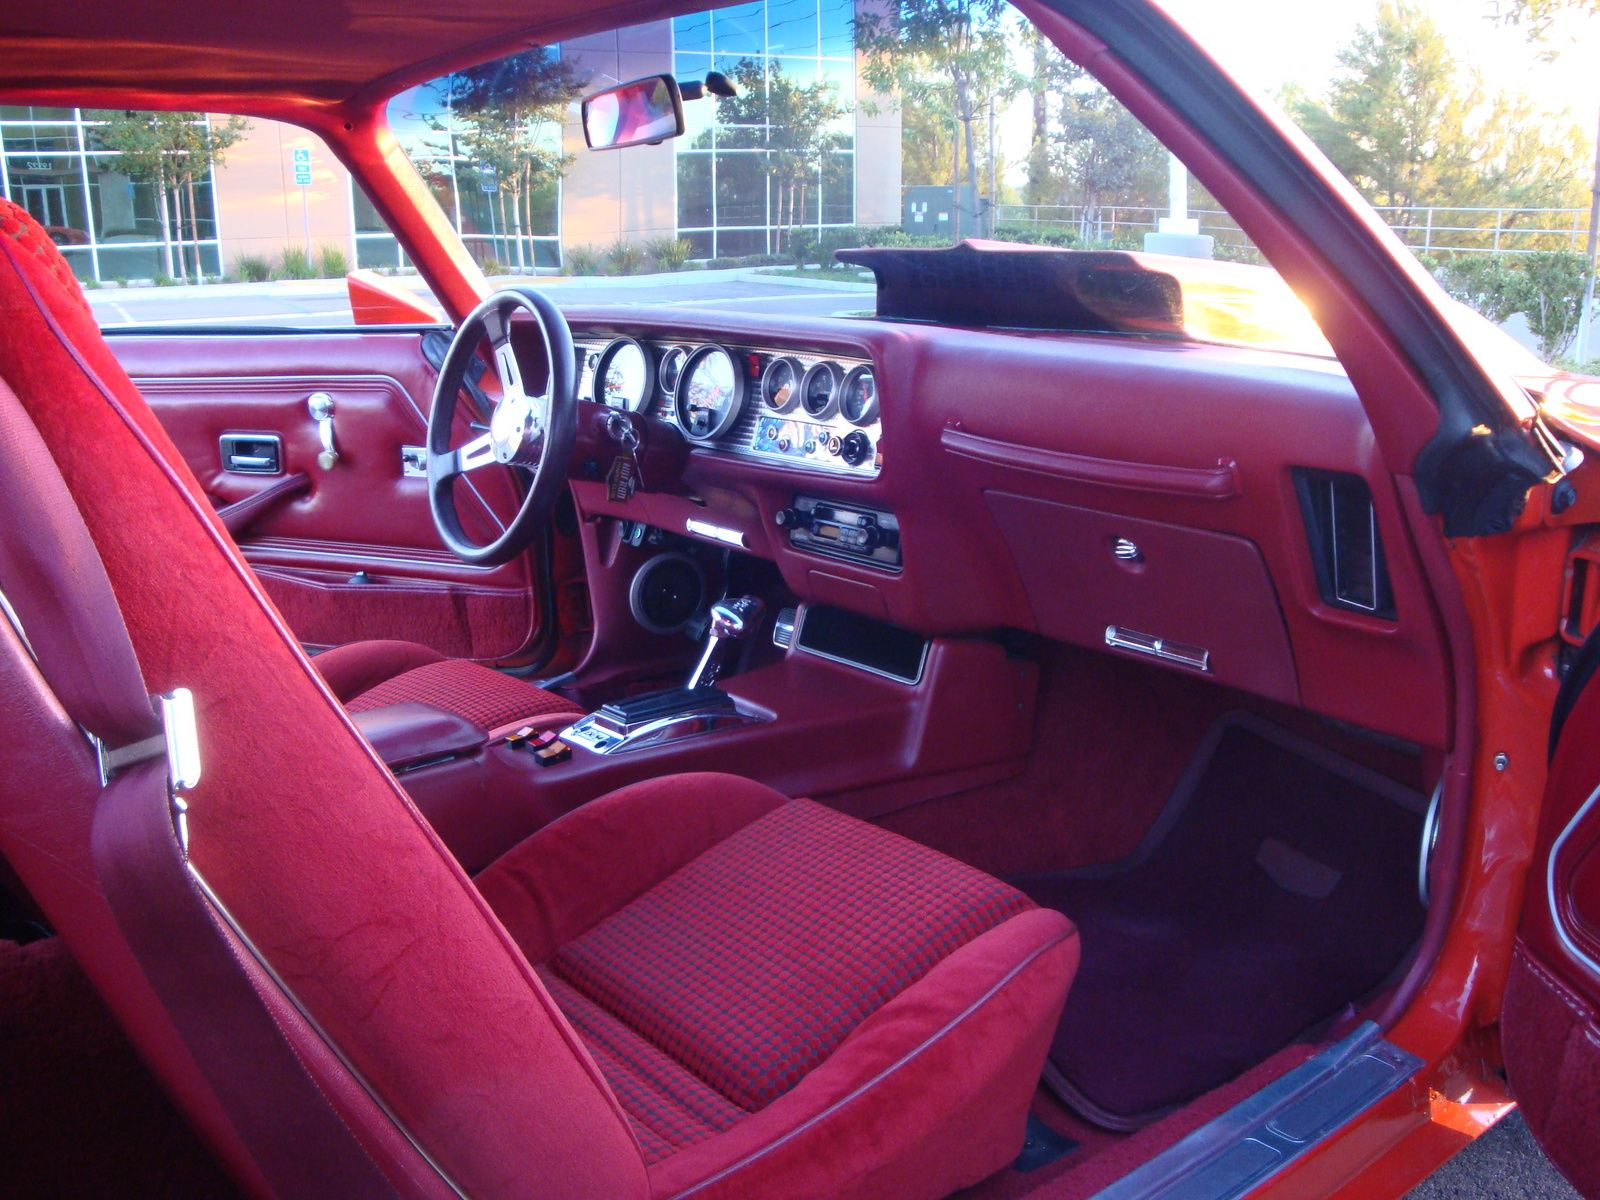 1980 Trans Am Picture Of 1980 Pontiac Trans Am Interior Pontiac Pinterest Cars